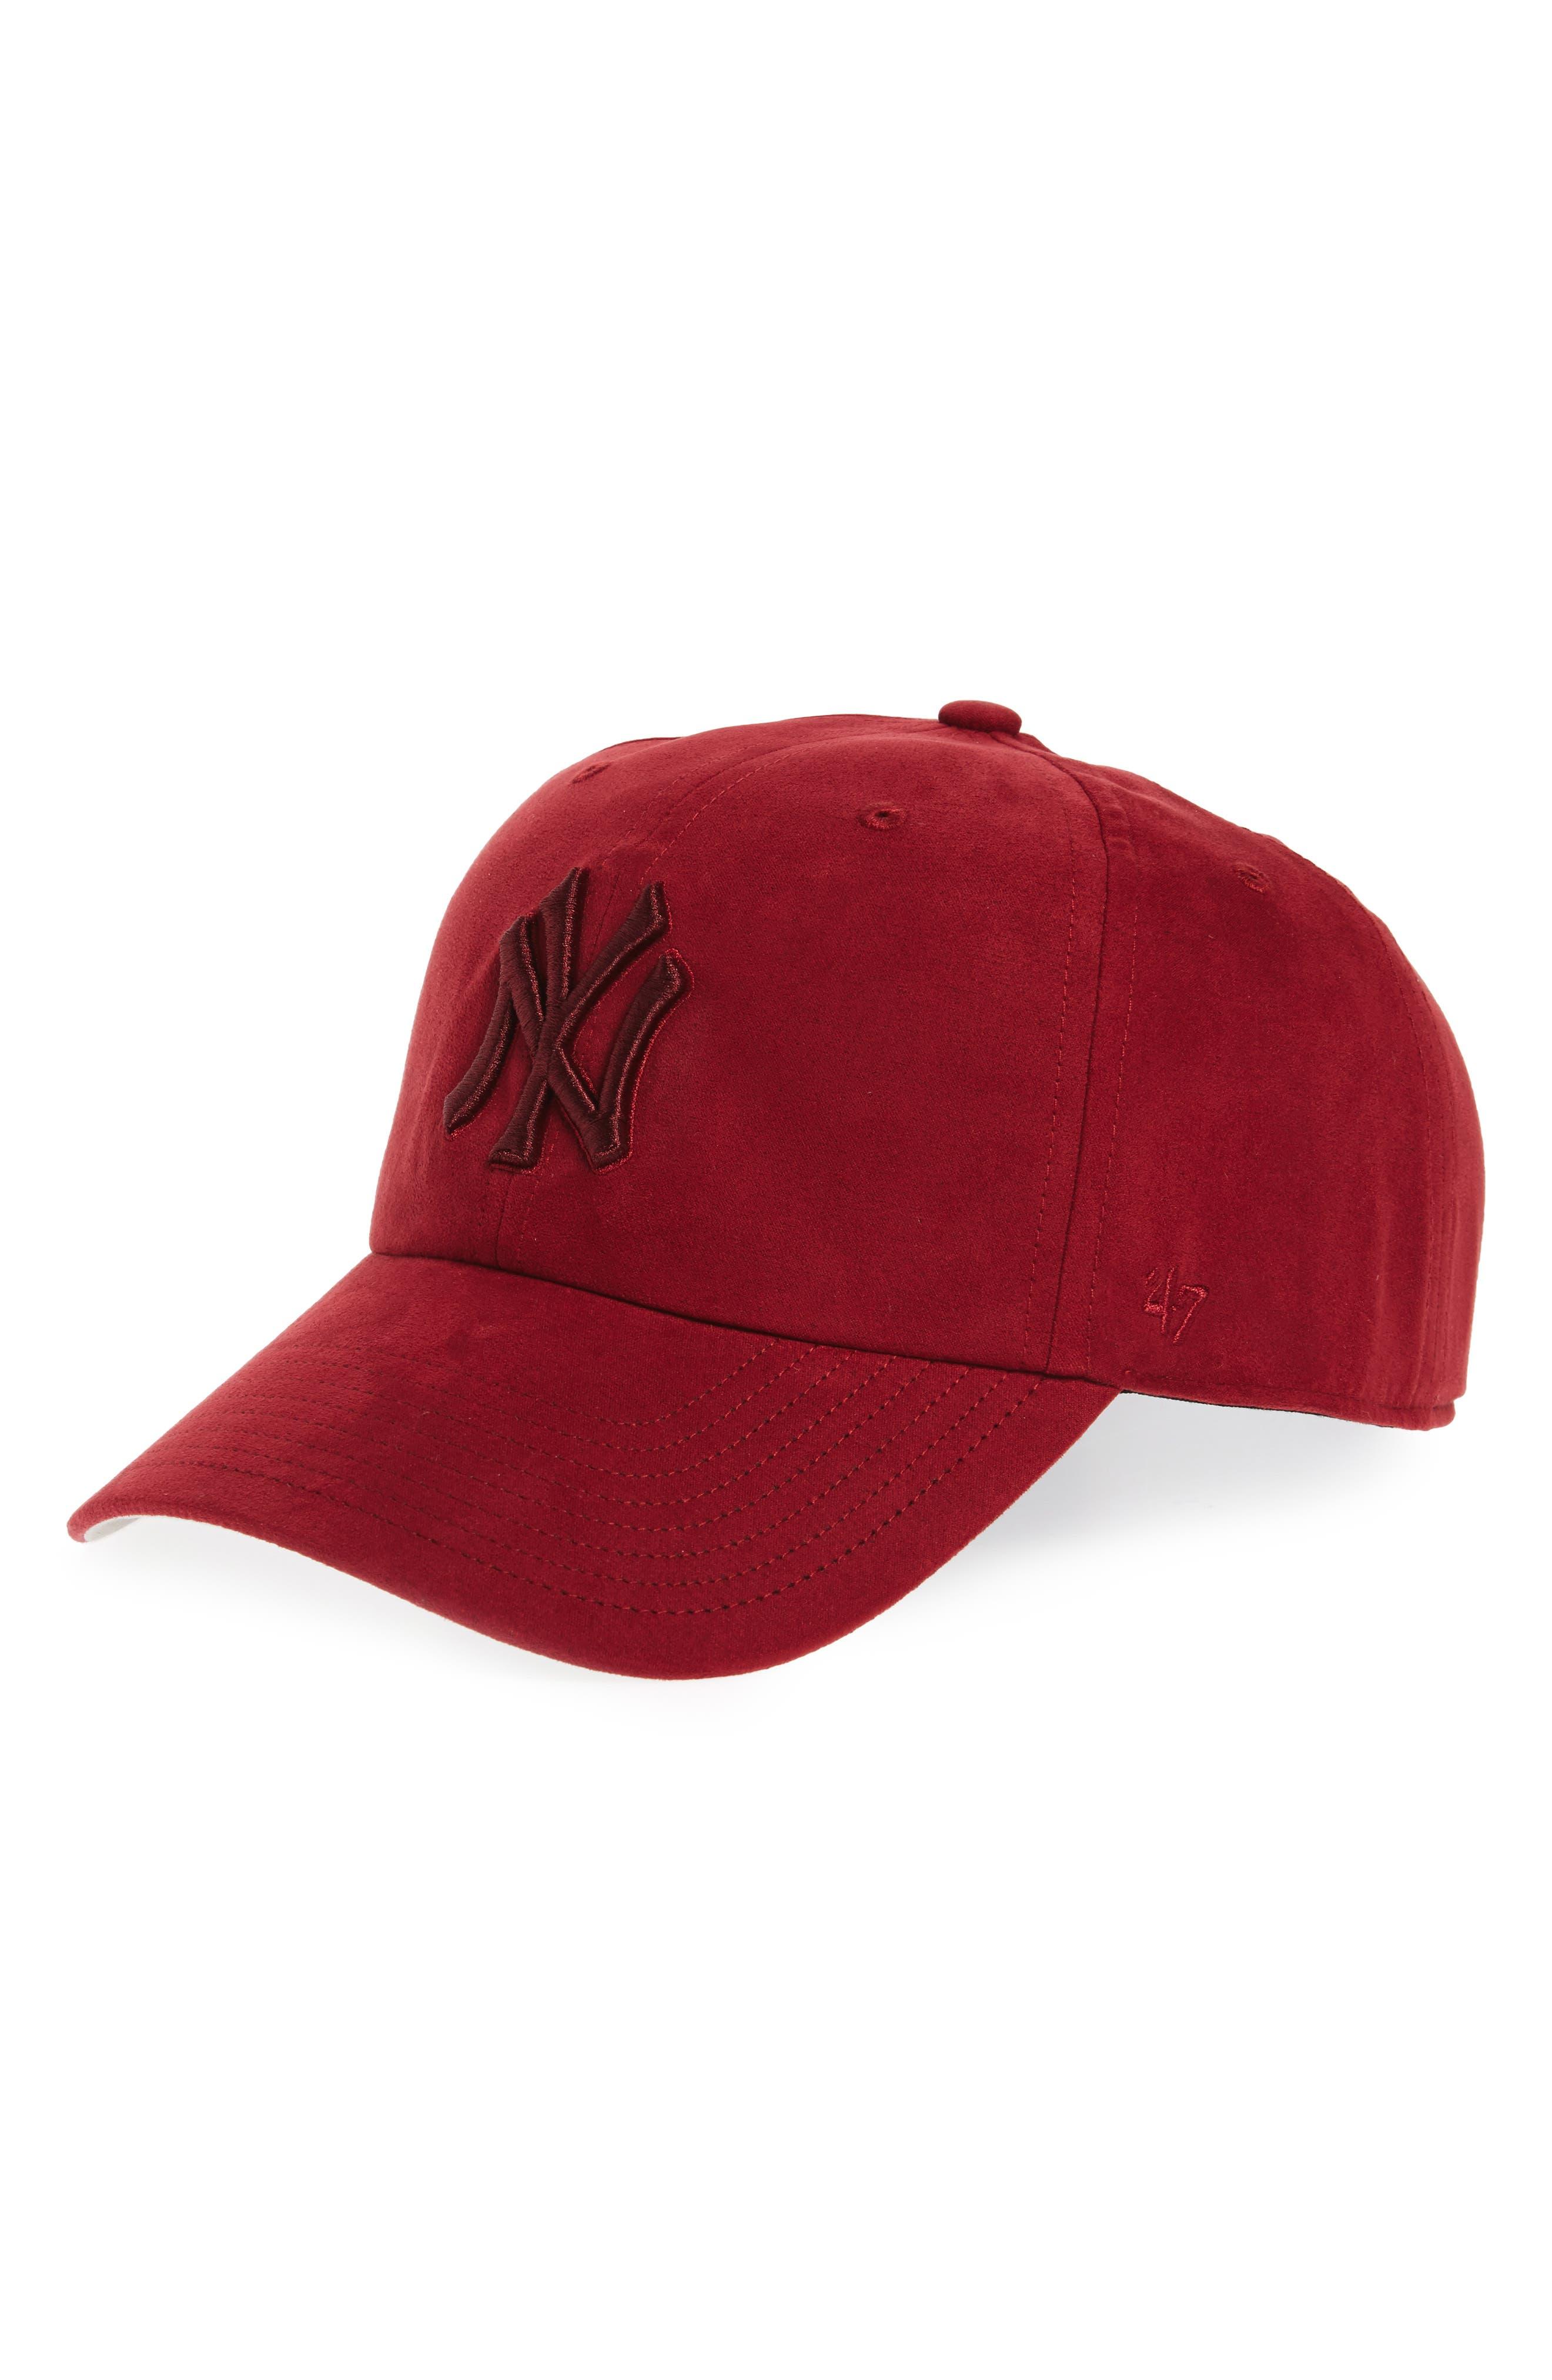 Main Image - '47 New York Yankees Baseball Cap